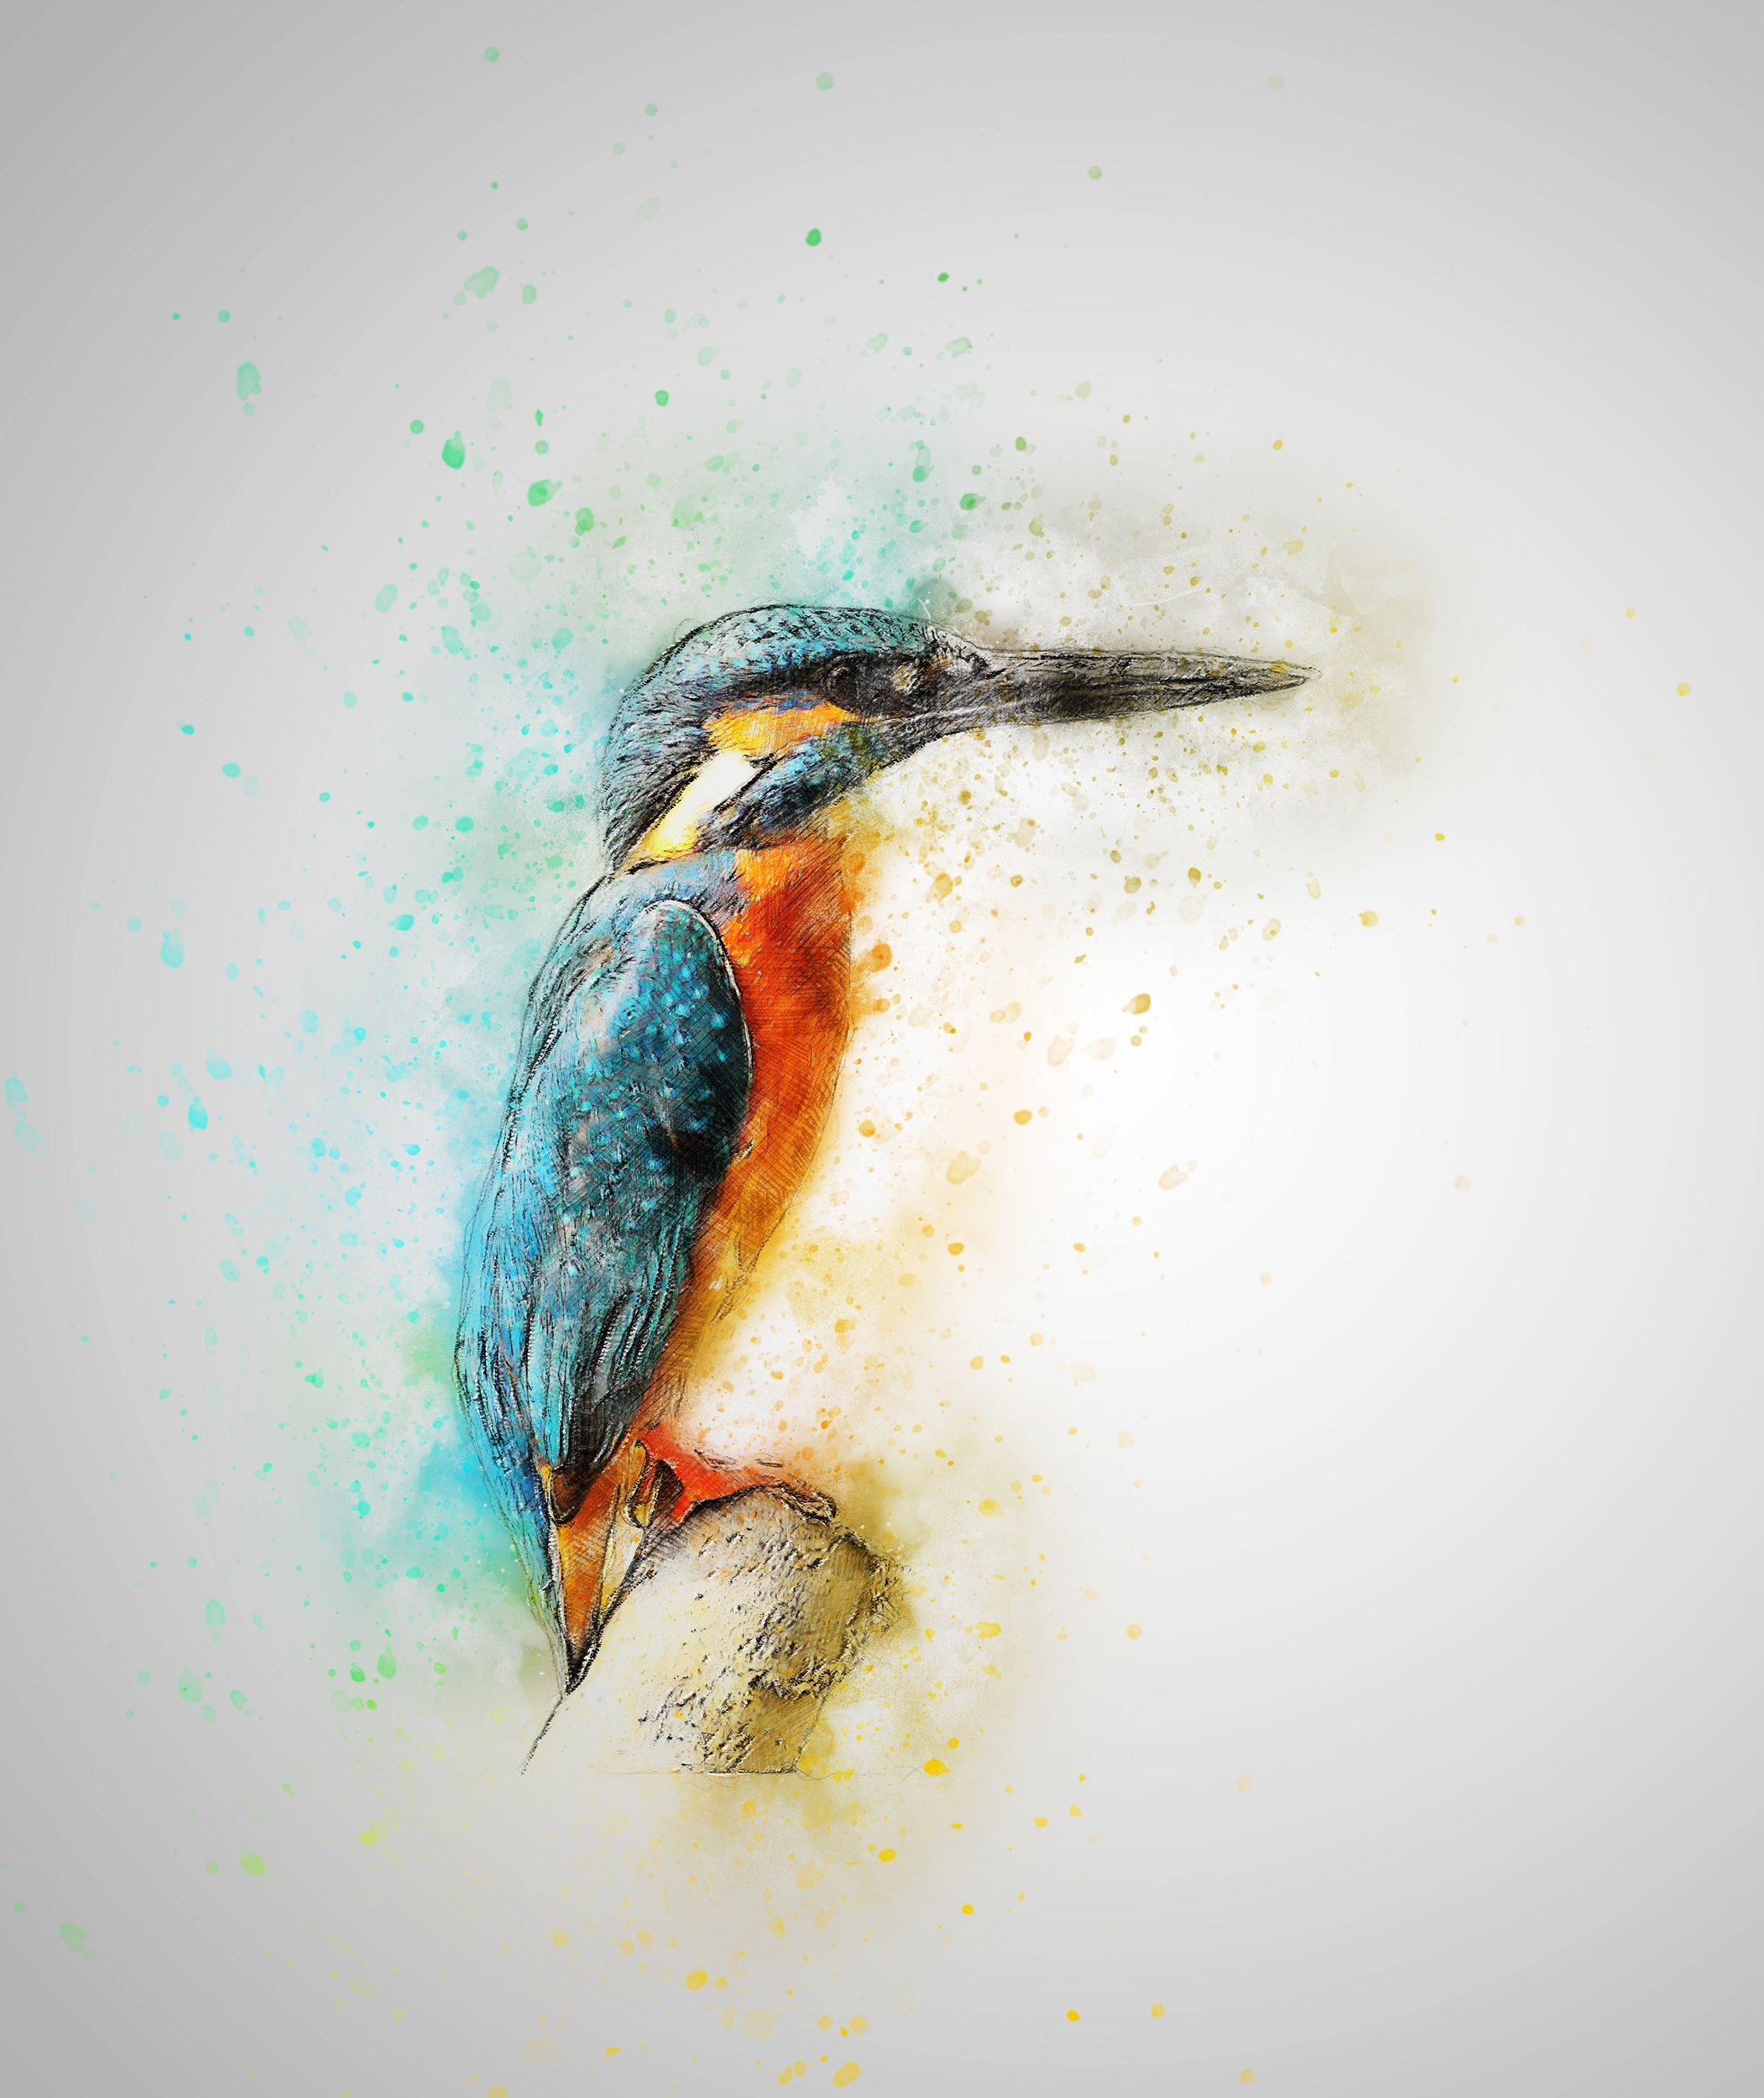 bird-2143860.jpg